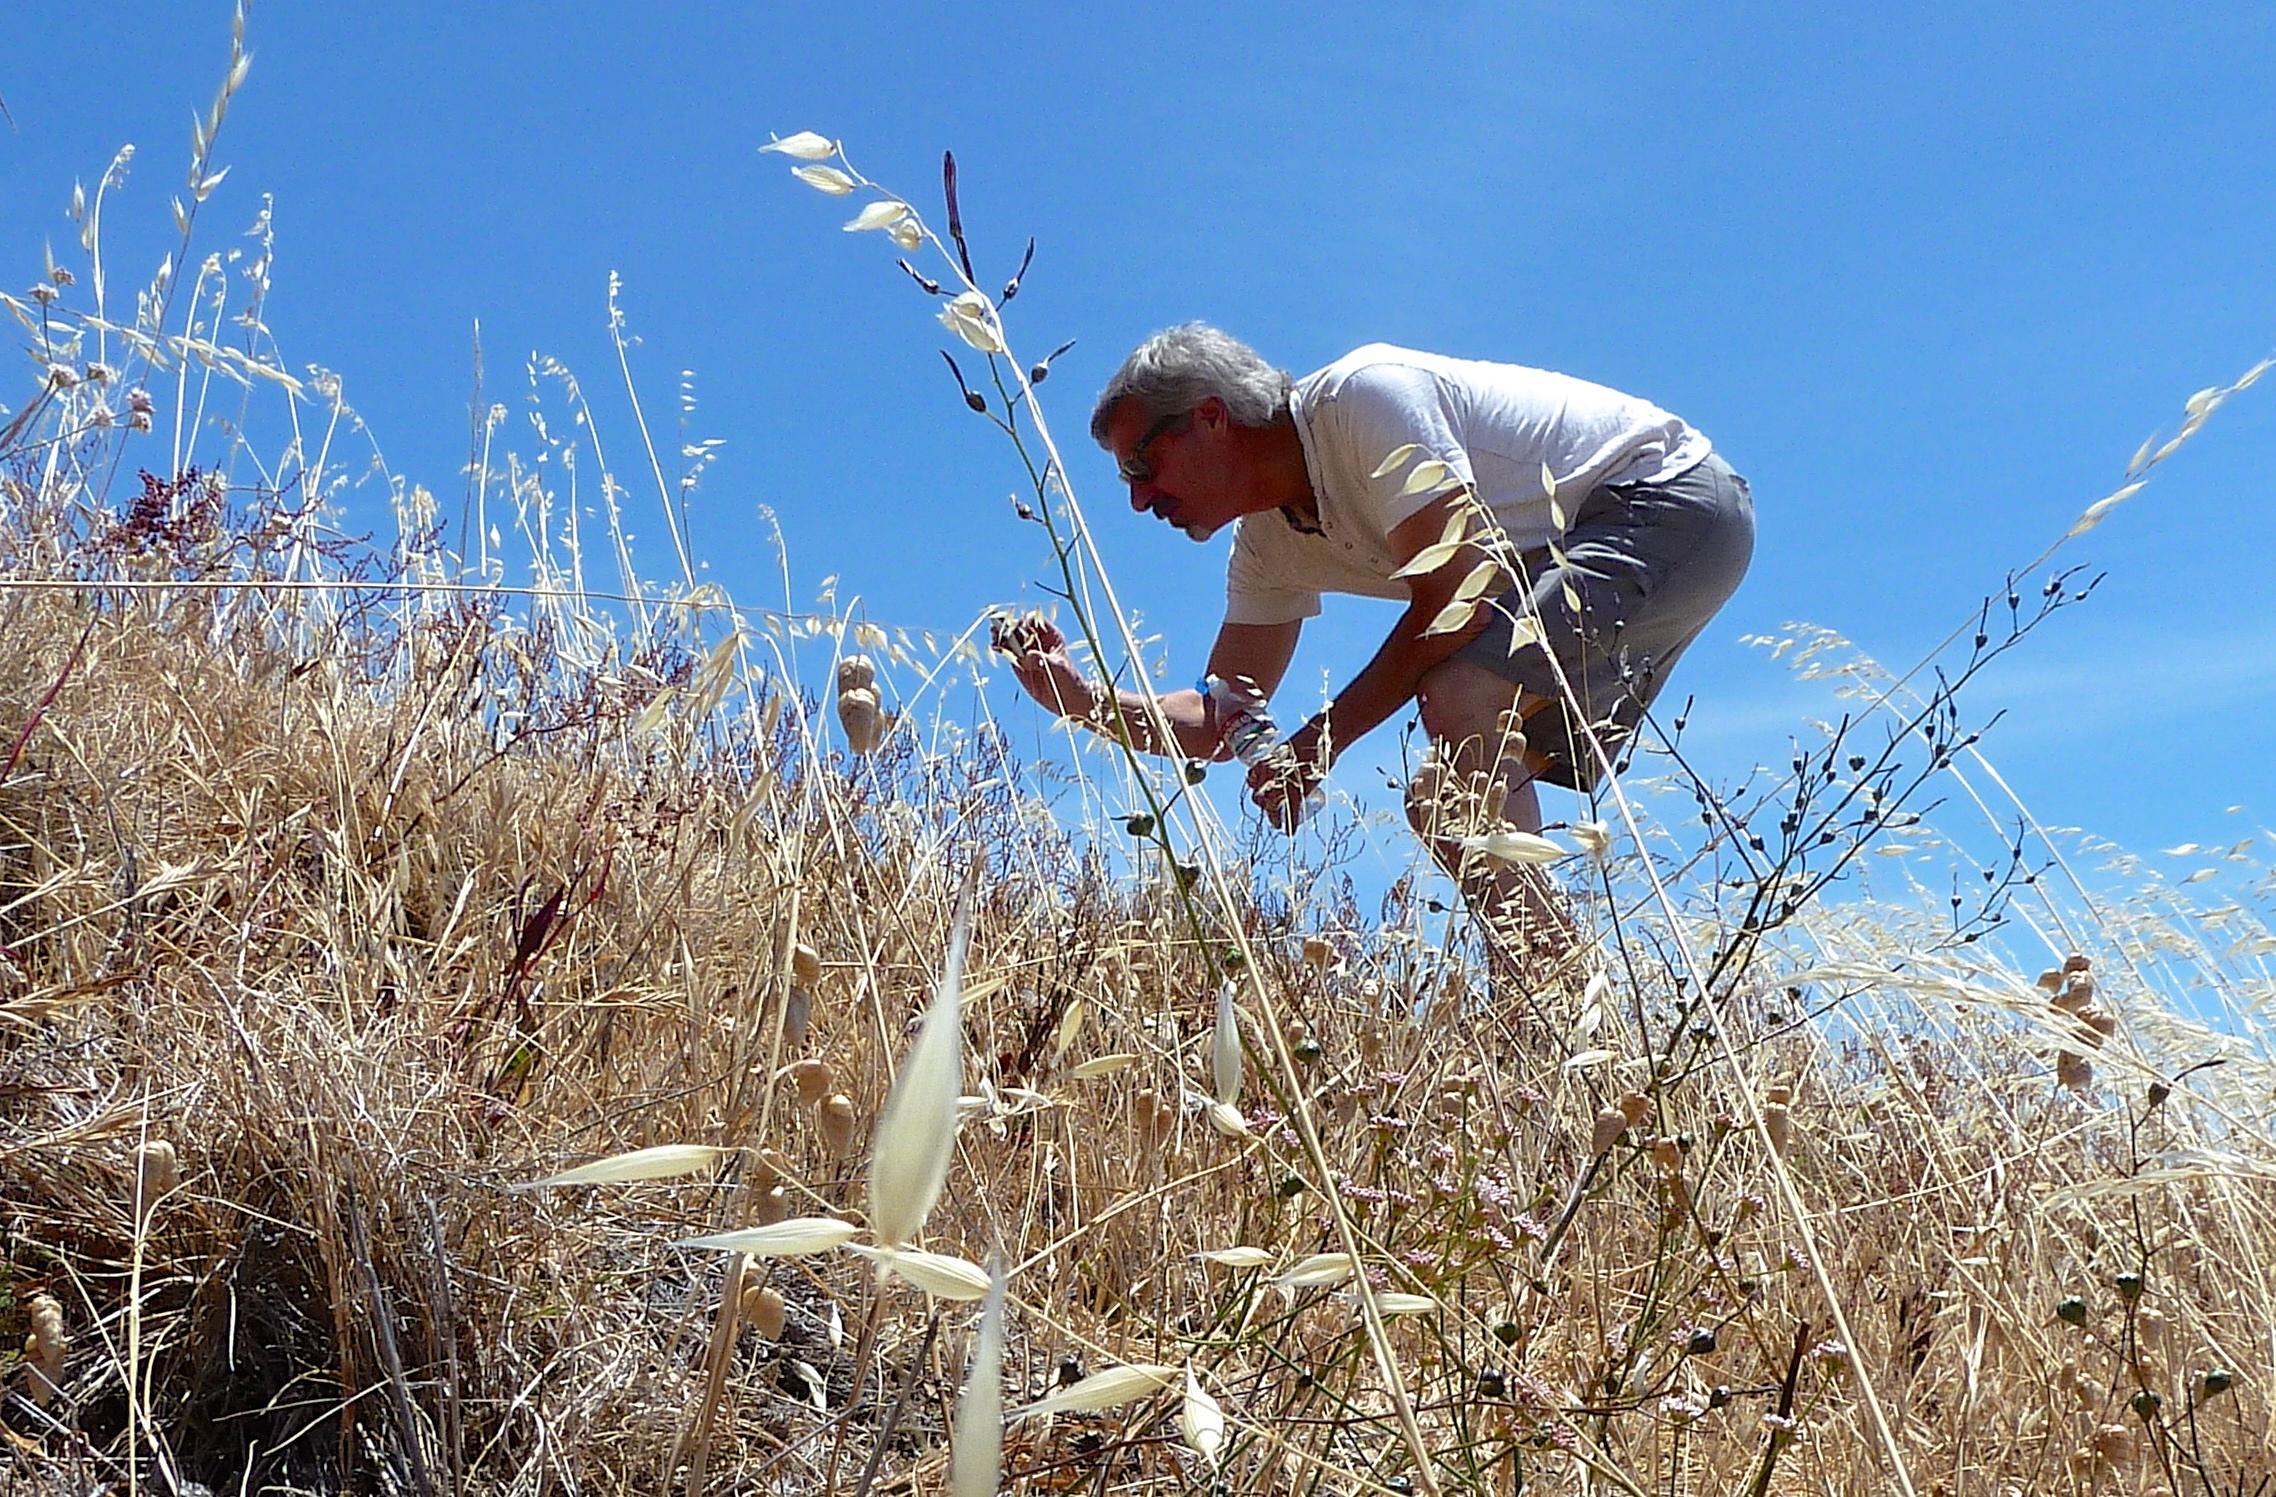 Jim Reese inspects the coastal flora on a hillside at Mt. Tamalpais State Park.